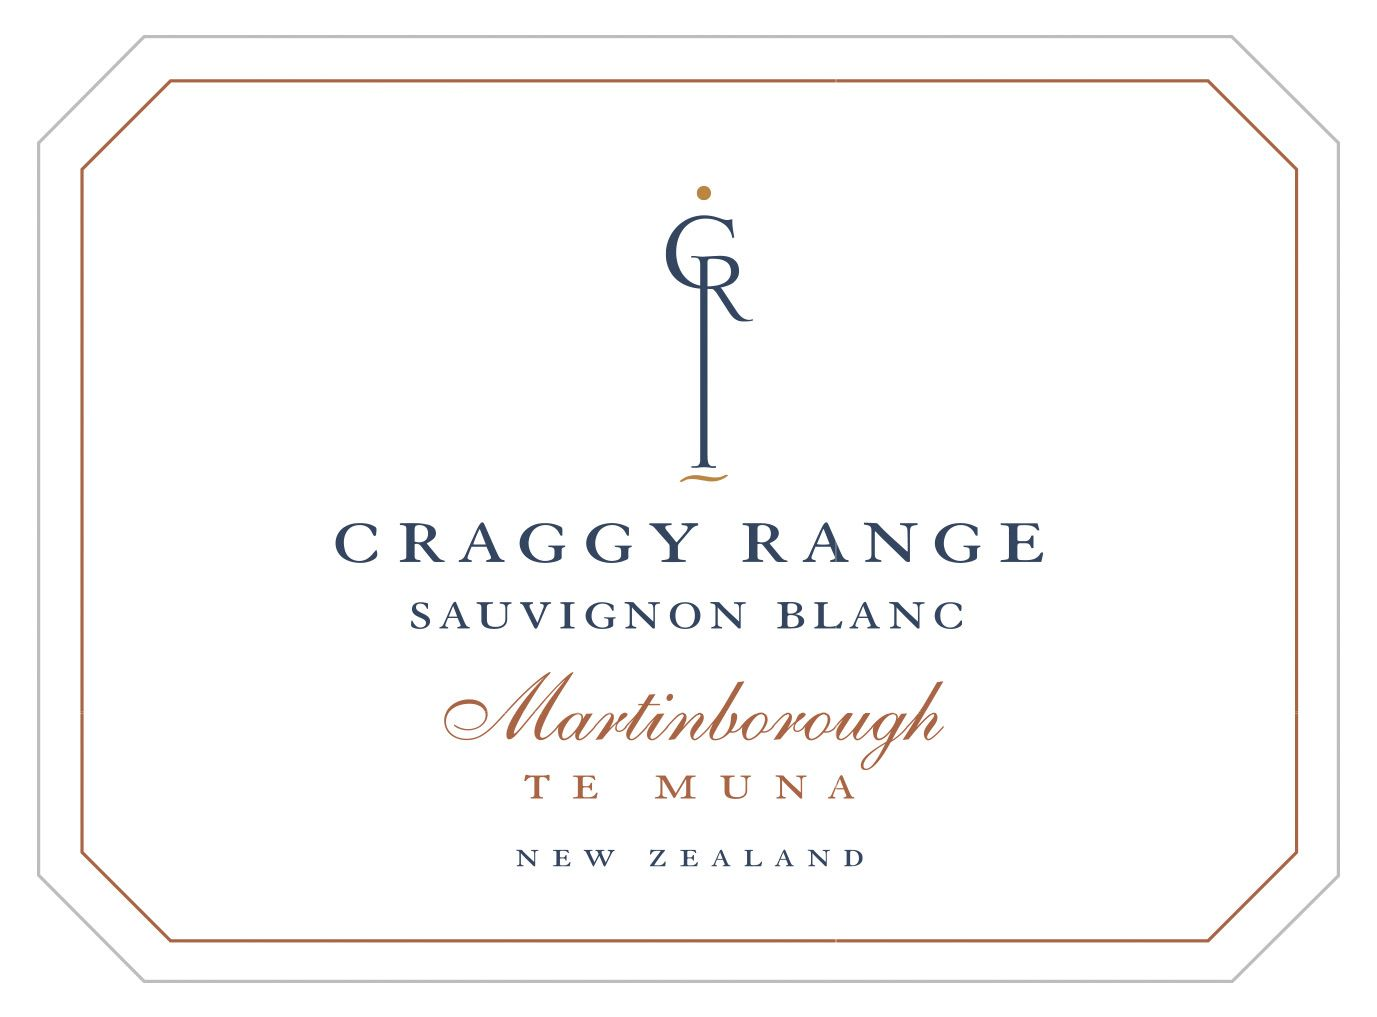 Craggy Range Winery Te Muna Road Vineyard Sauvignon Blanc 2018